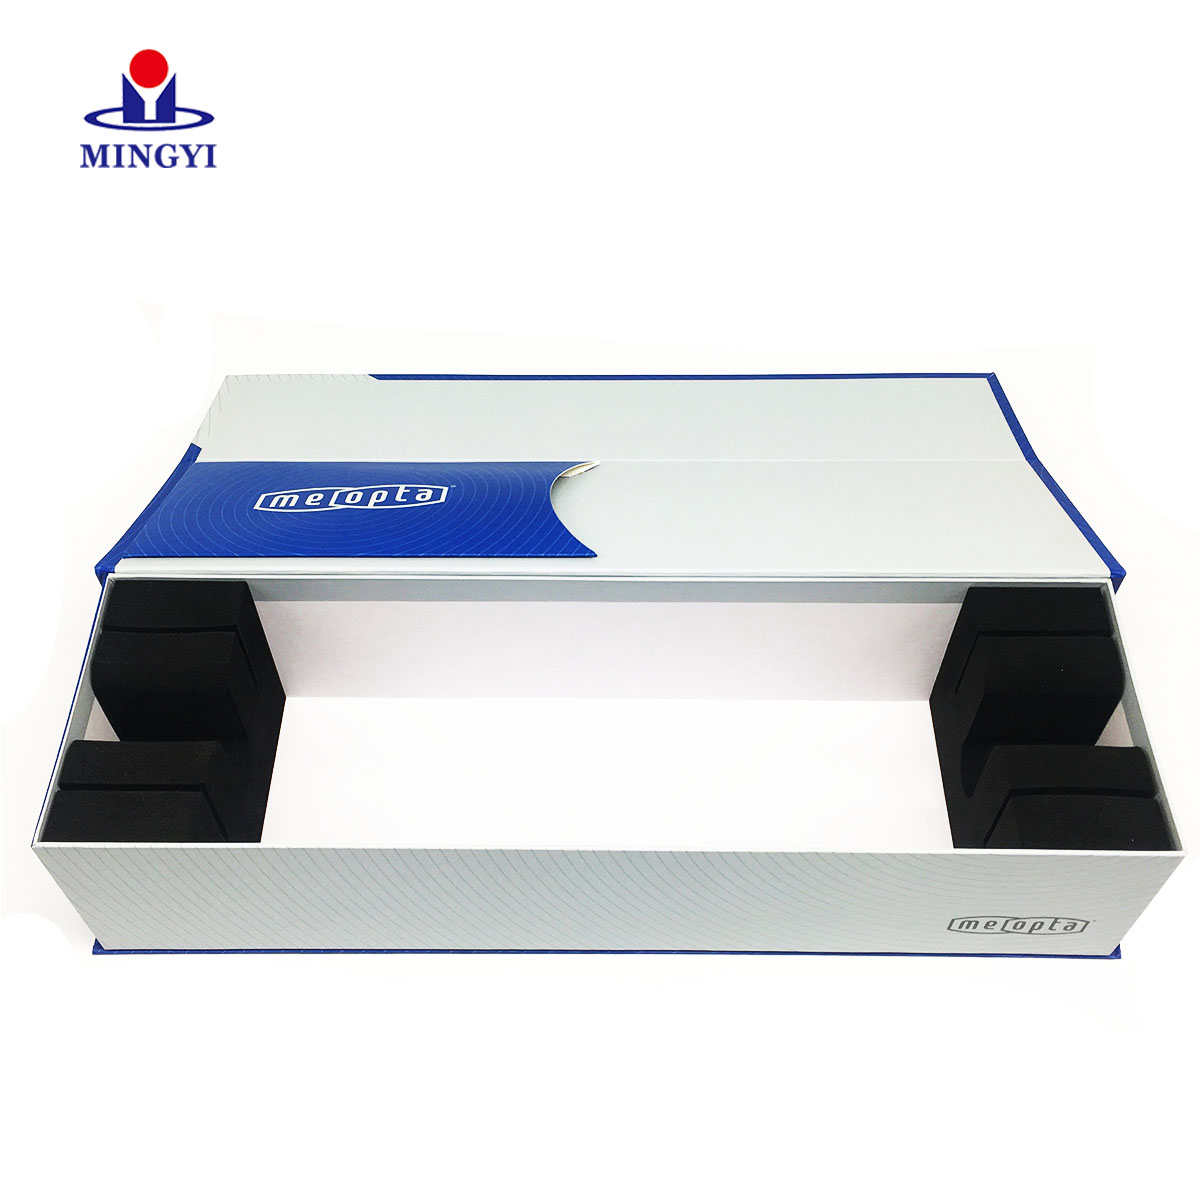 Mingyi Printing Array image36